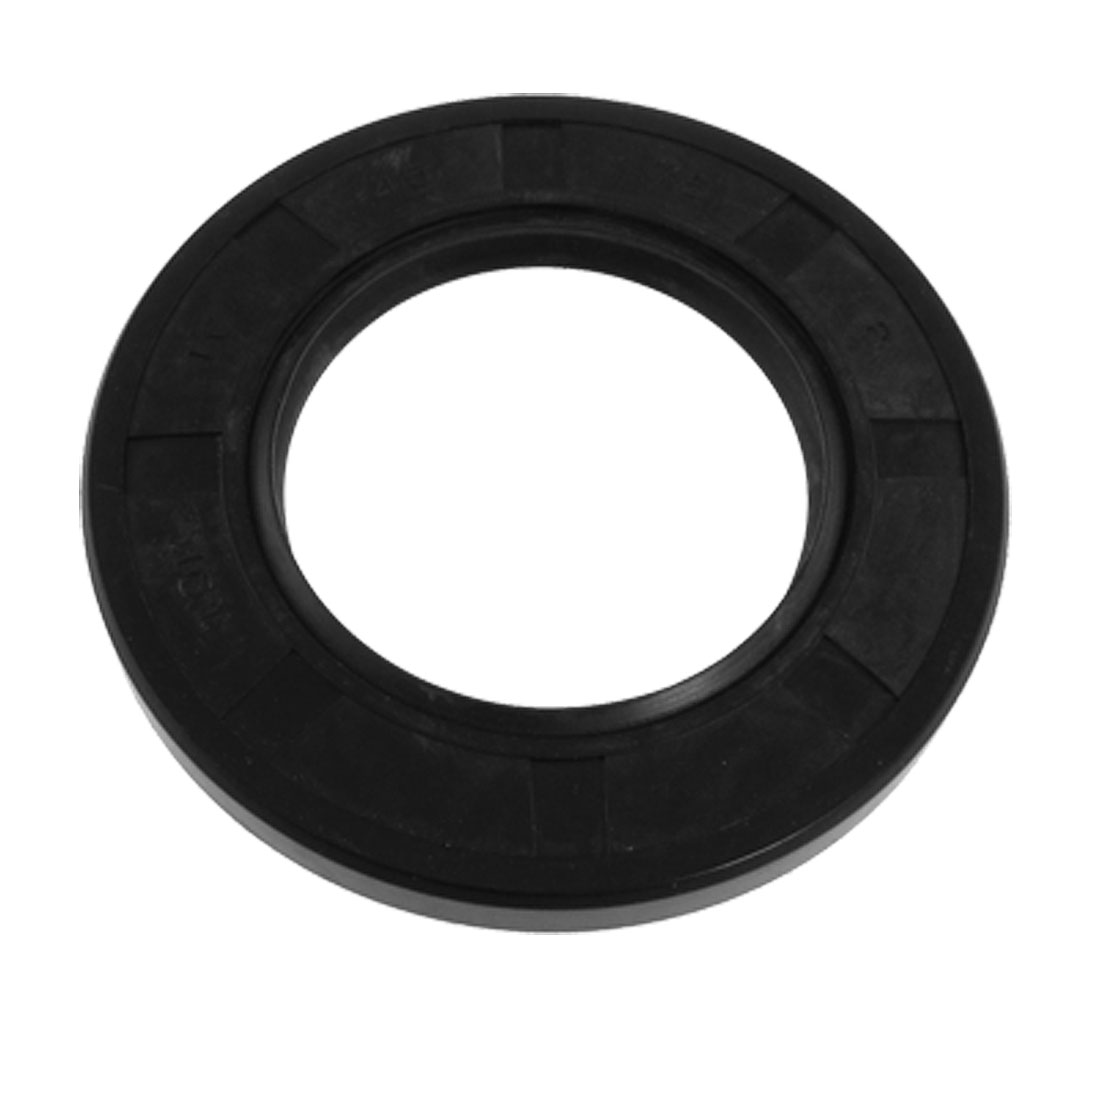 45mm x 75mm x 8mm Steel Spring Double Lip Metric Rotary Shaft Oil Seal TC